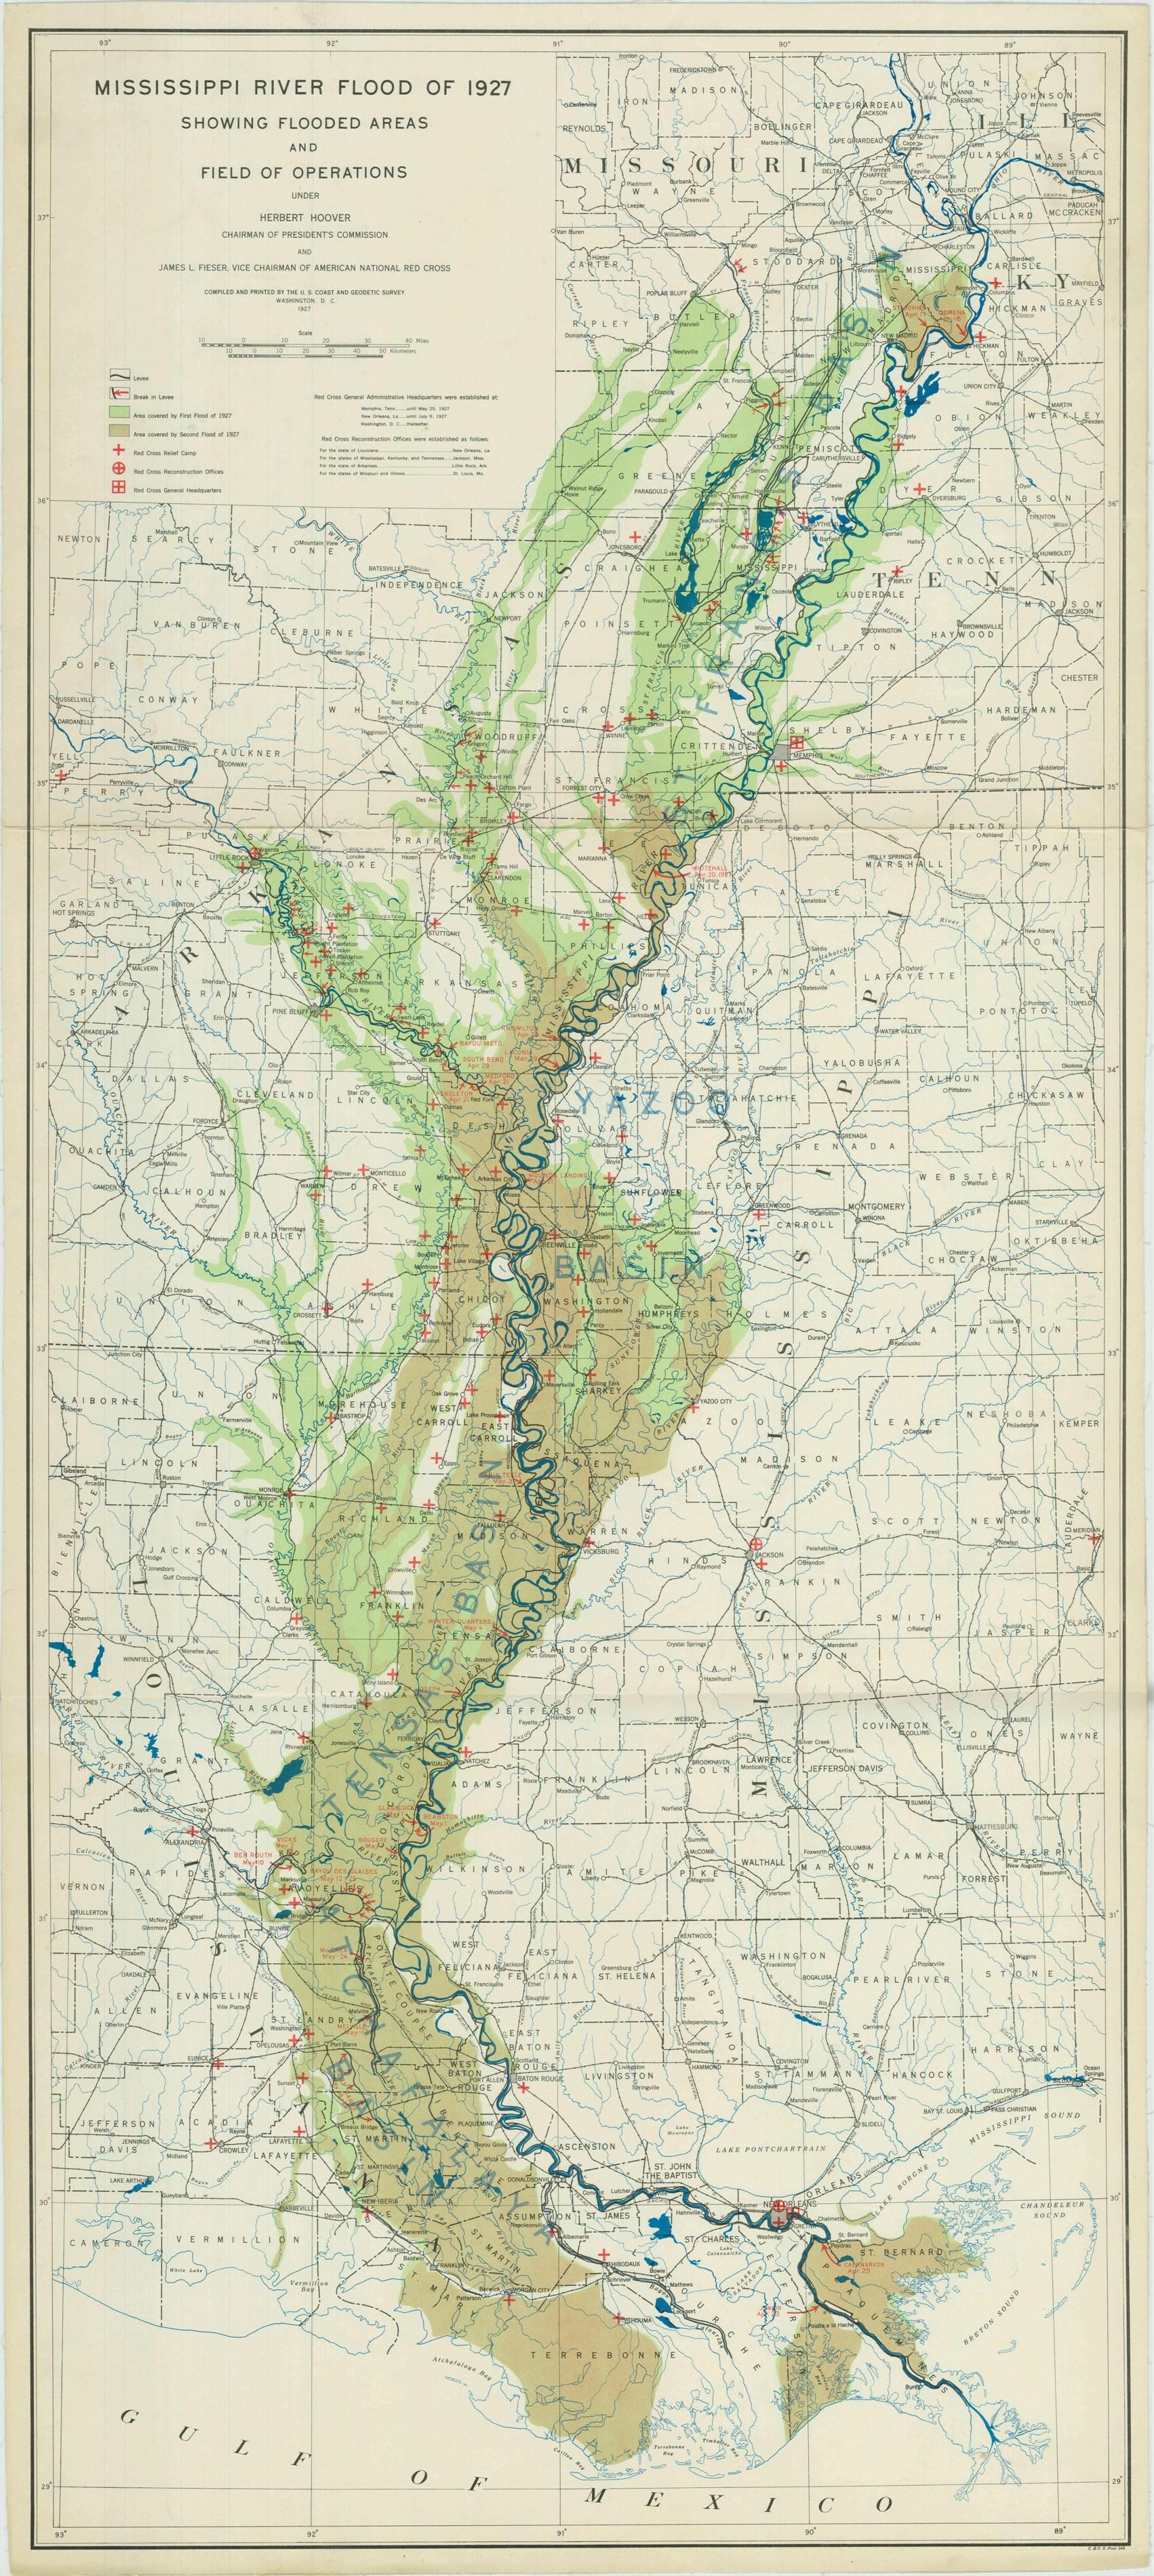 RG 23 Mississippi Flood Map 1927 NAID 2436794